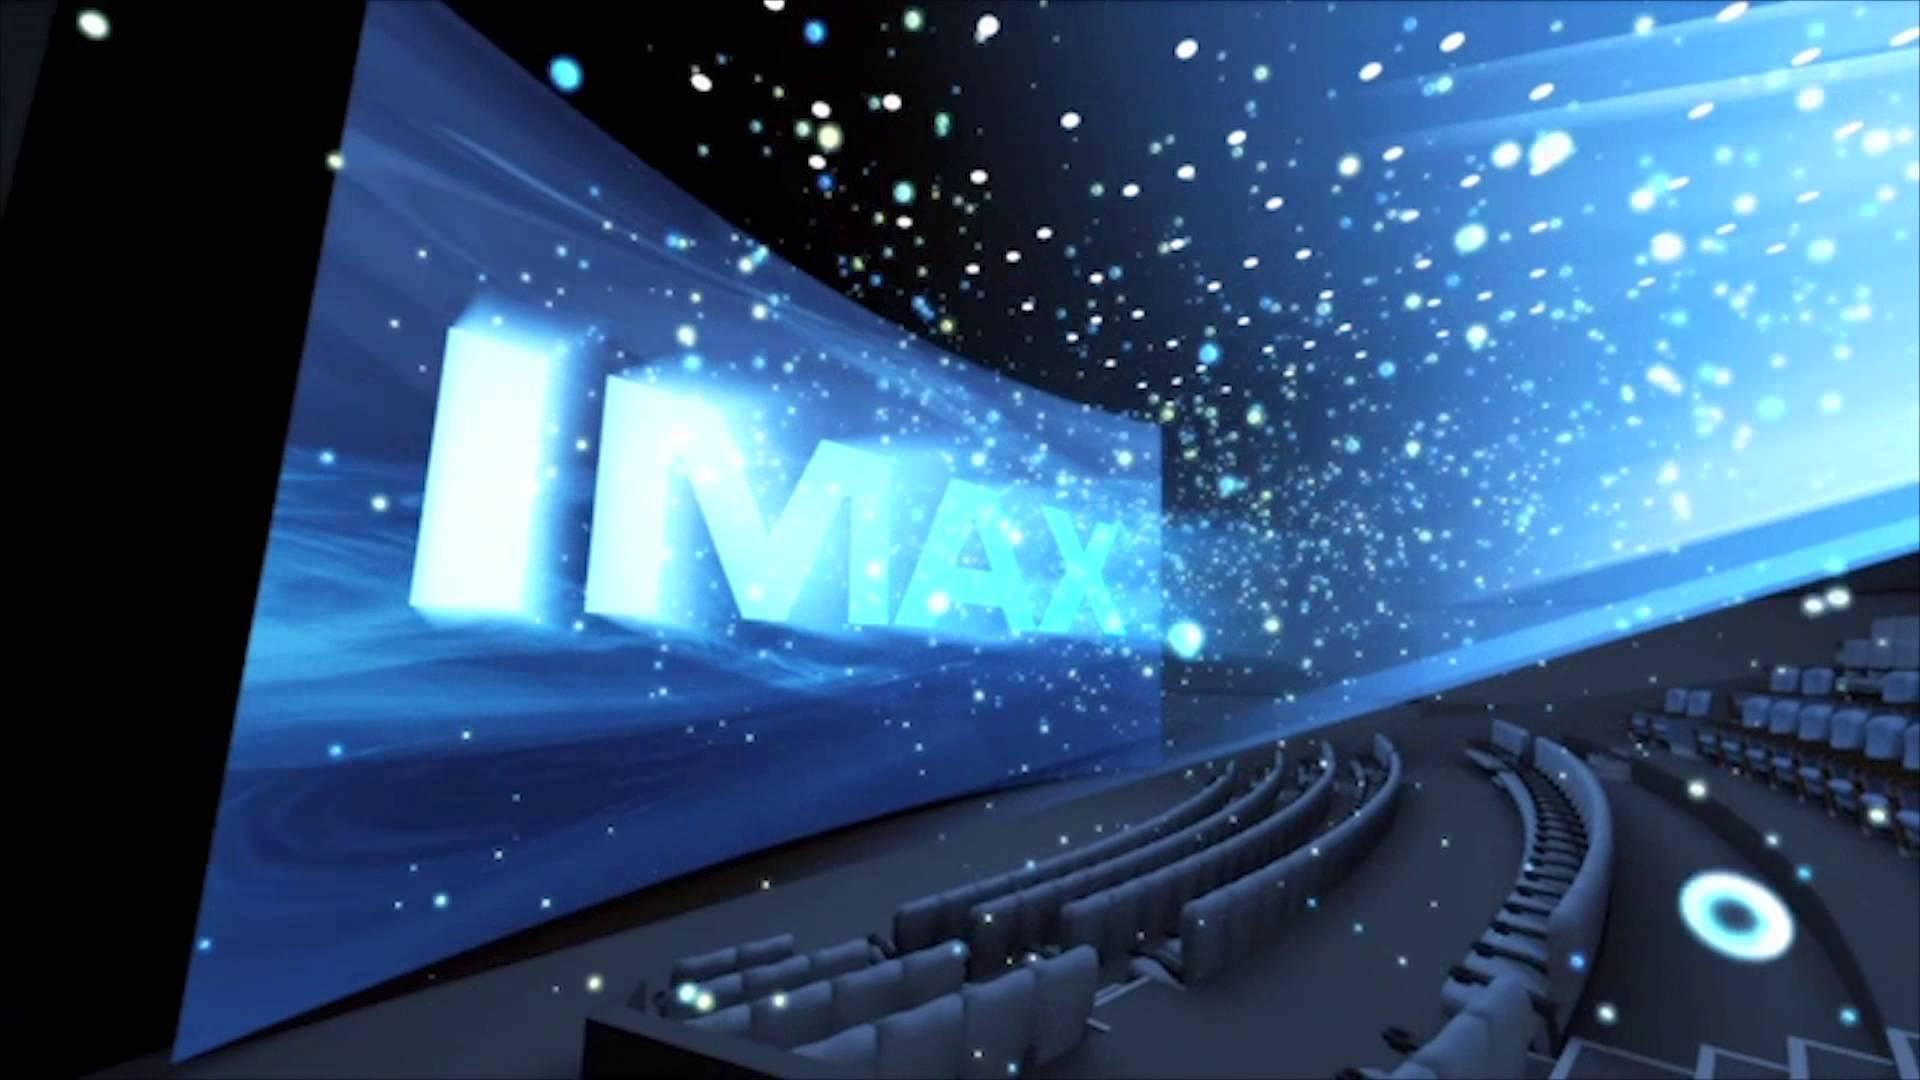 Inauguró el segundo IMAX de Argentina